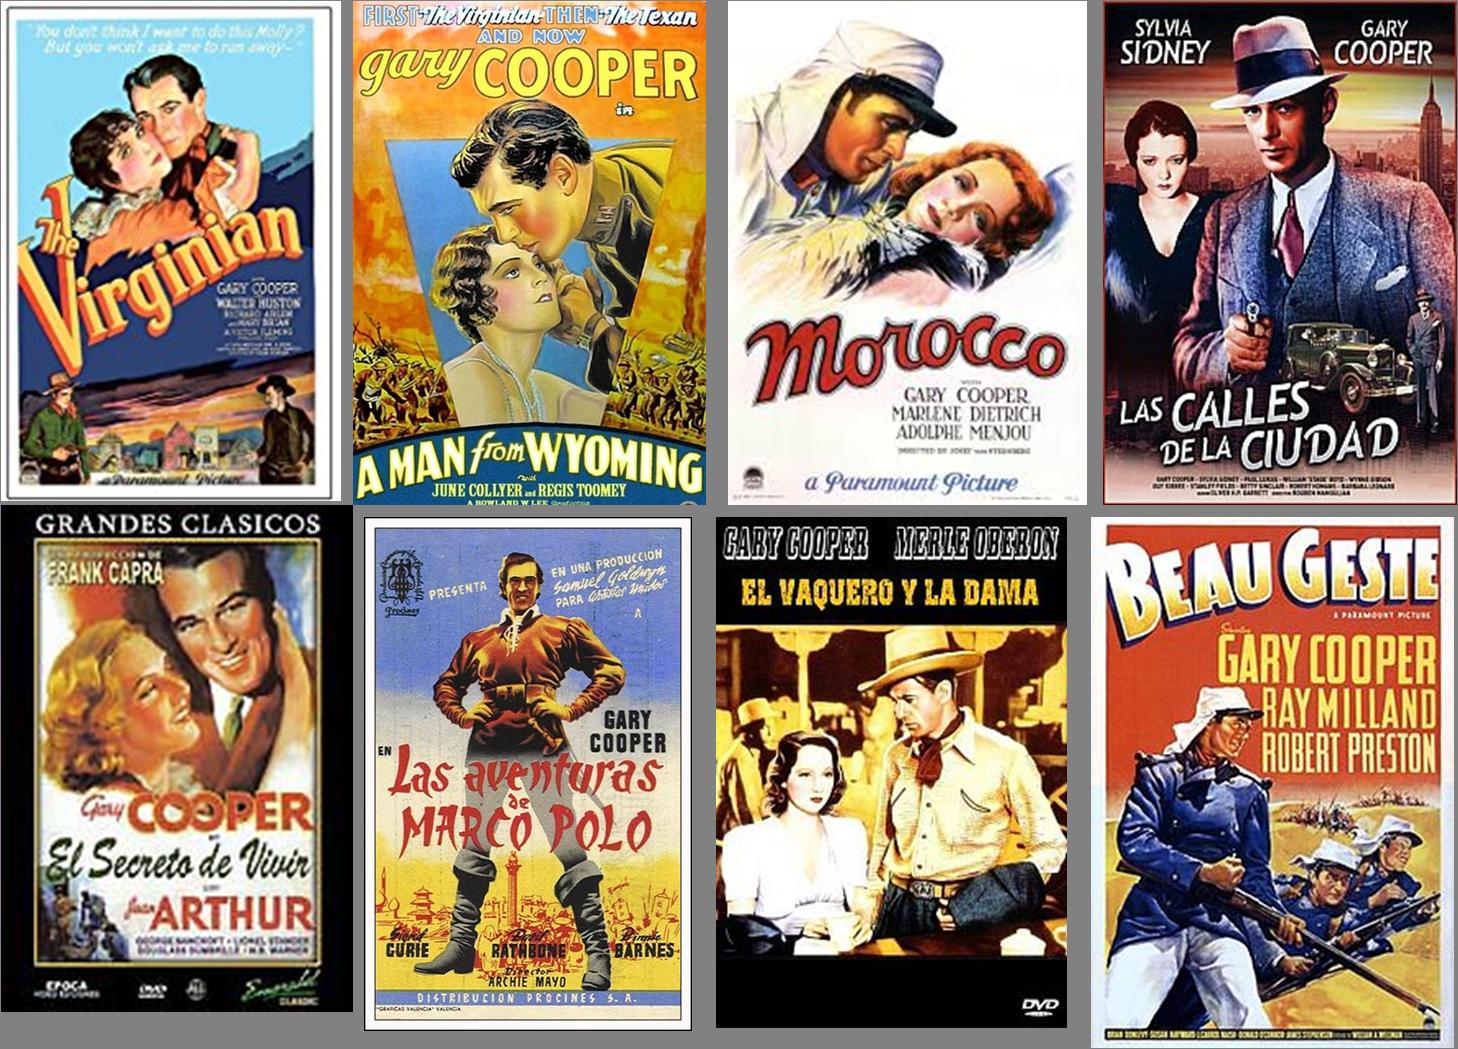 Gary Cooper afiche